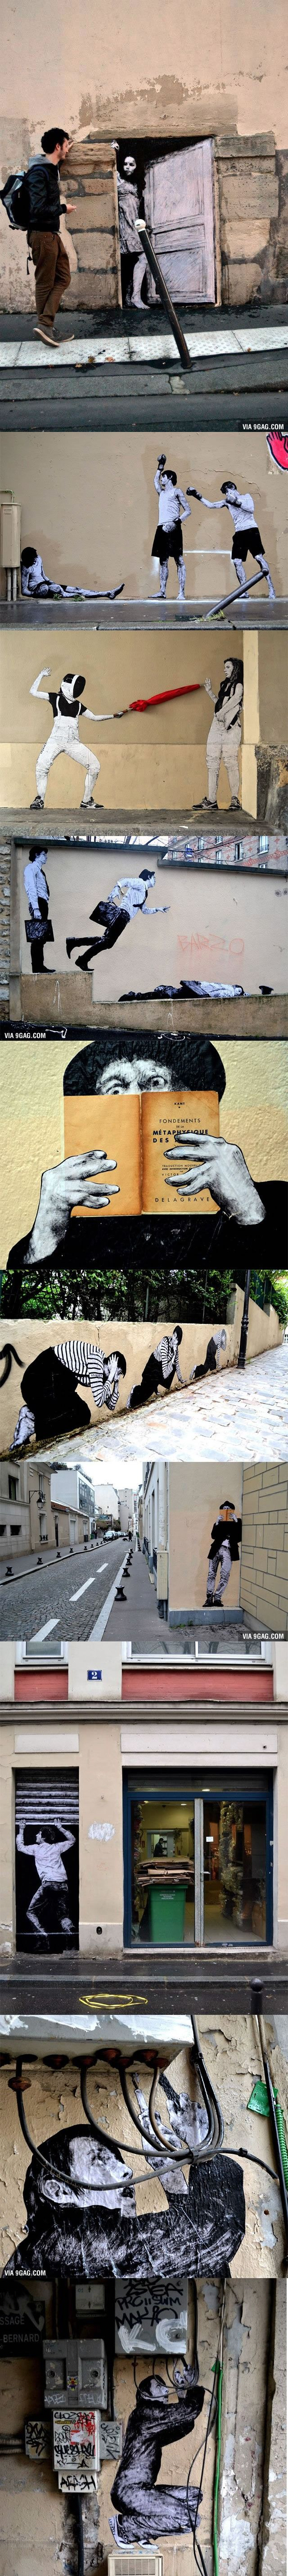 The Best Street Art I've Ever Seen